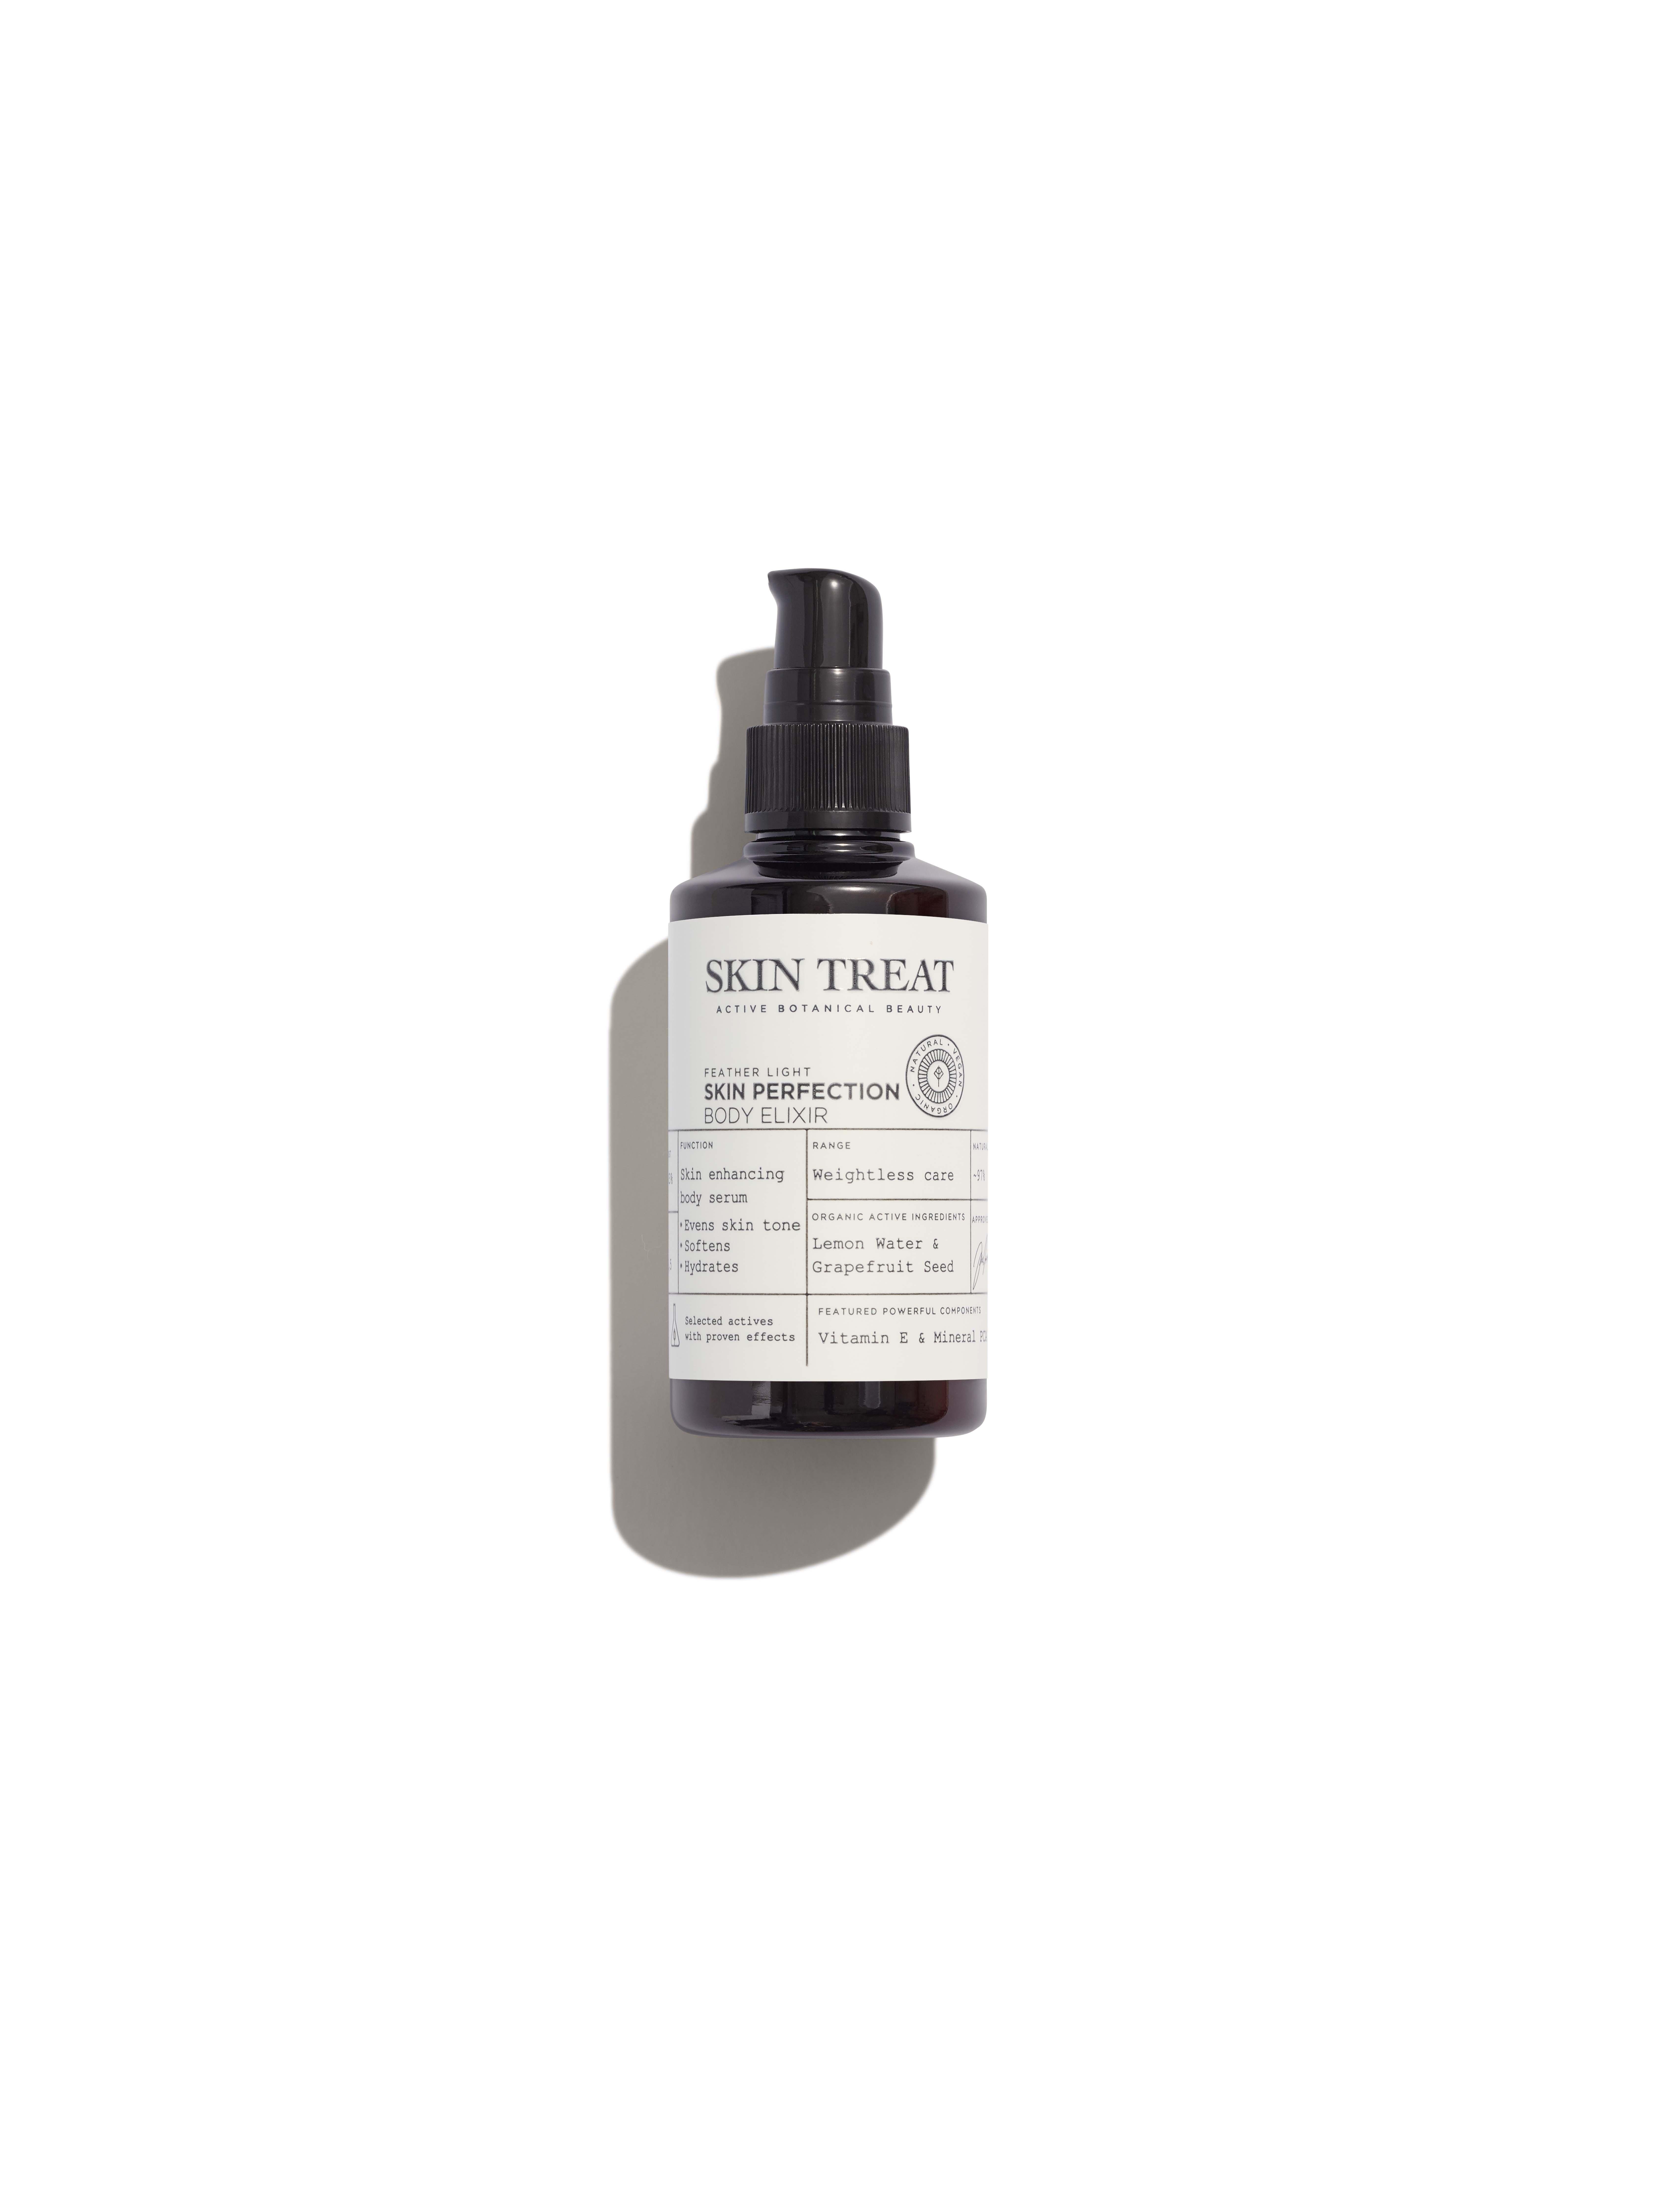 Skin Perfection Body Elixir